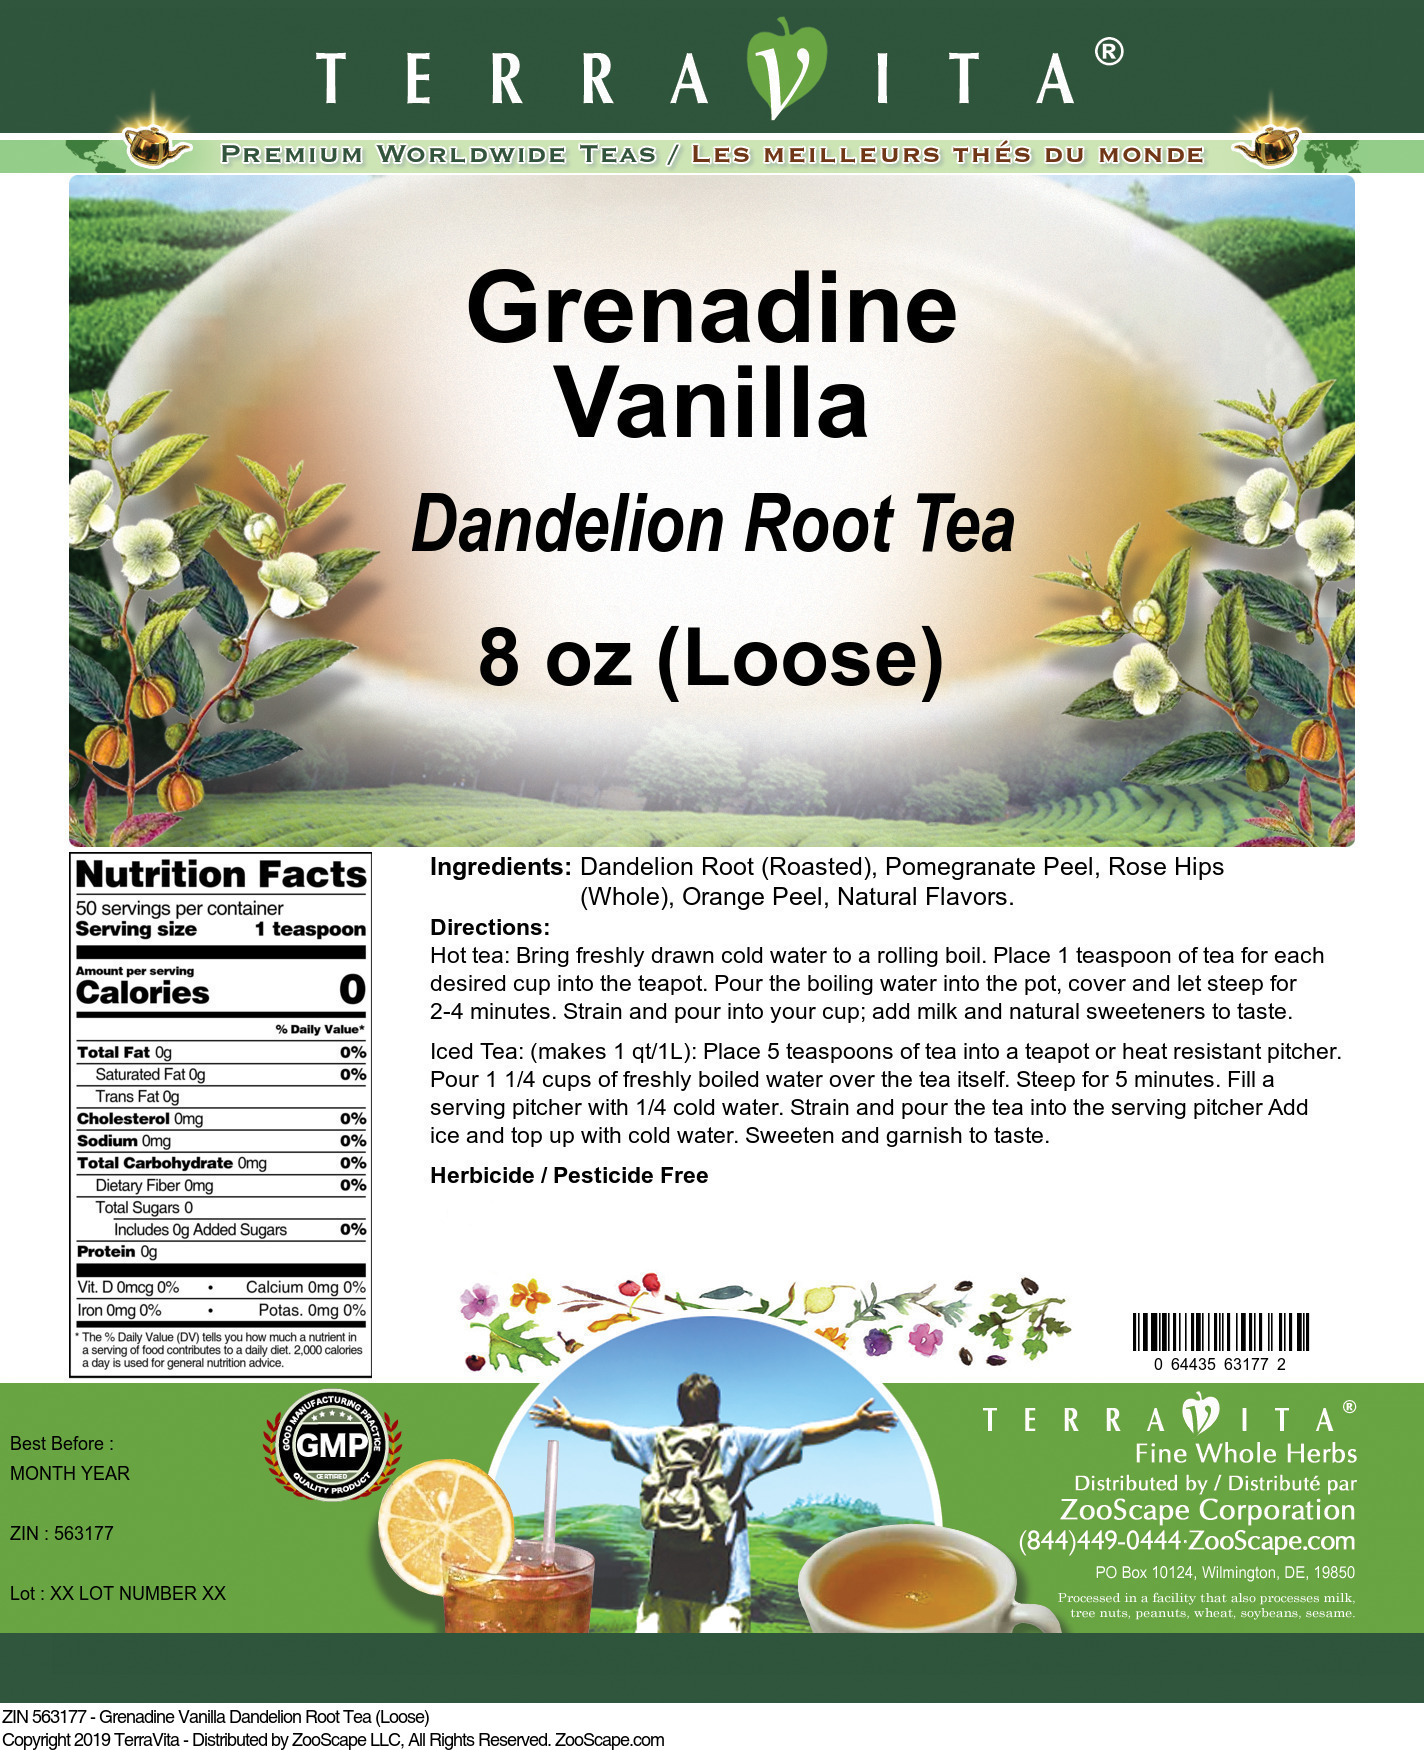 Grenadine Vanilla Dandelion Root